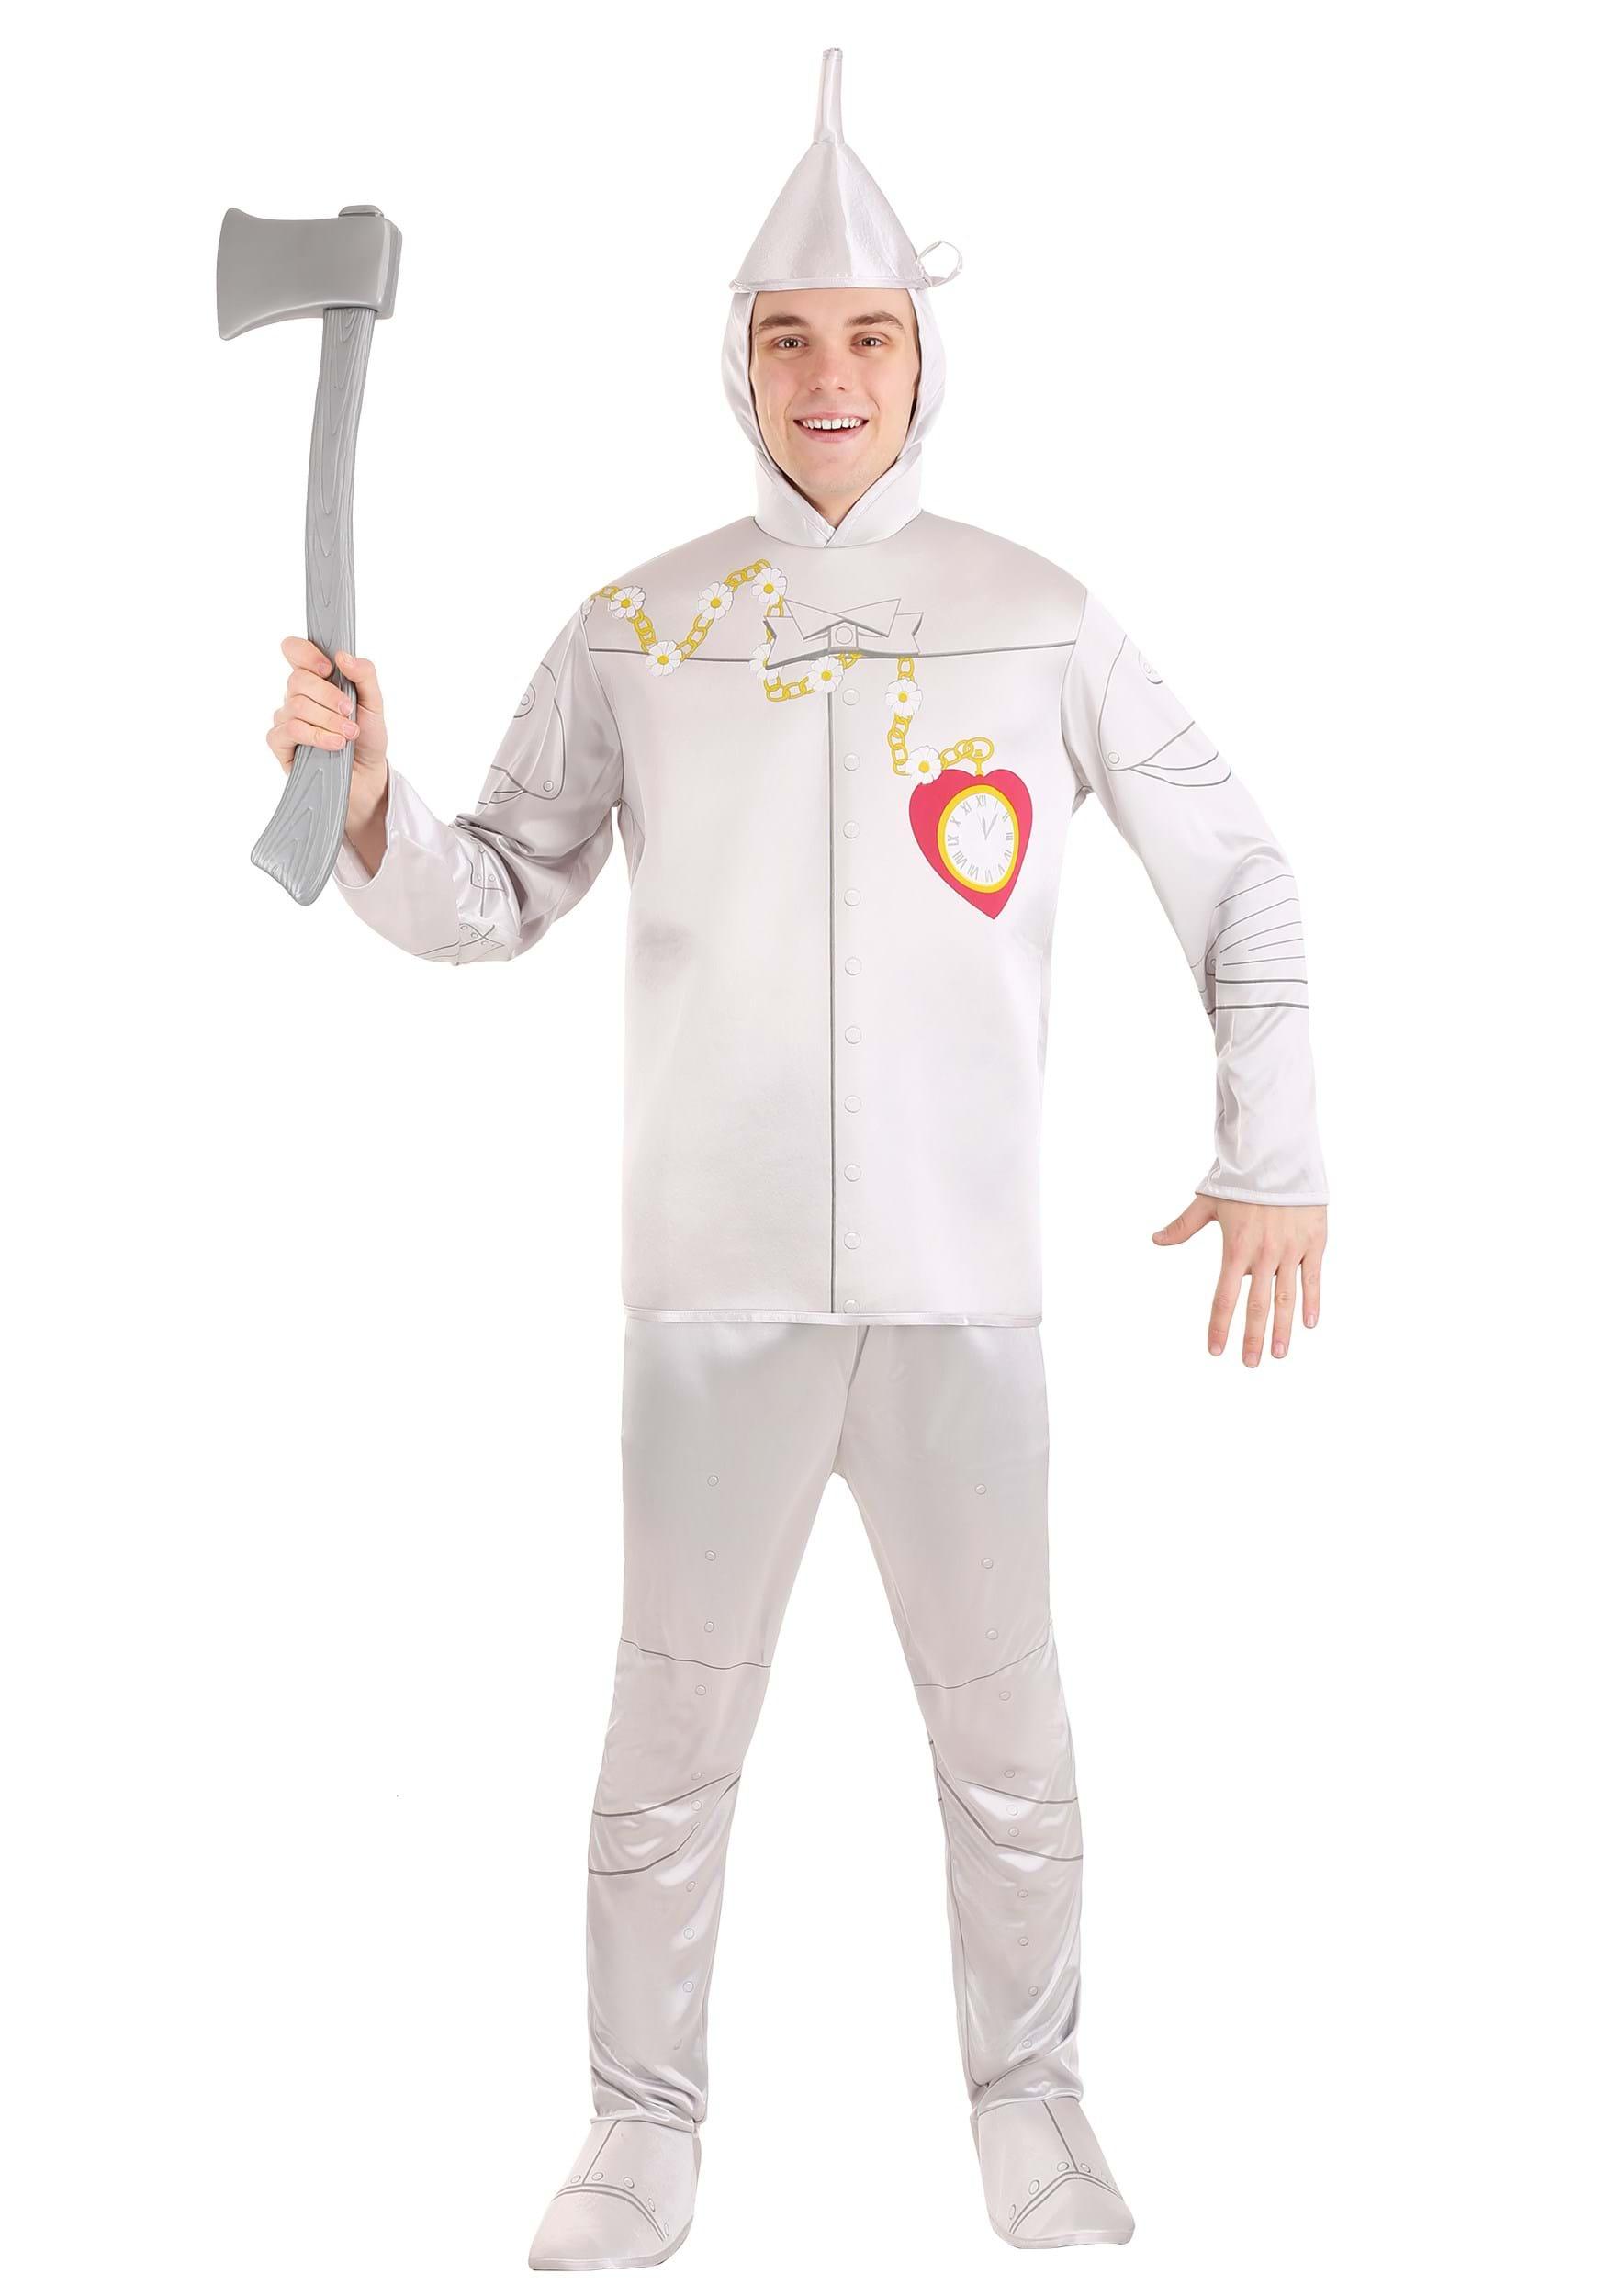 Tin man Costume Teen Size - Wizard of Oz